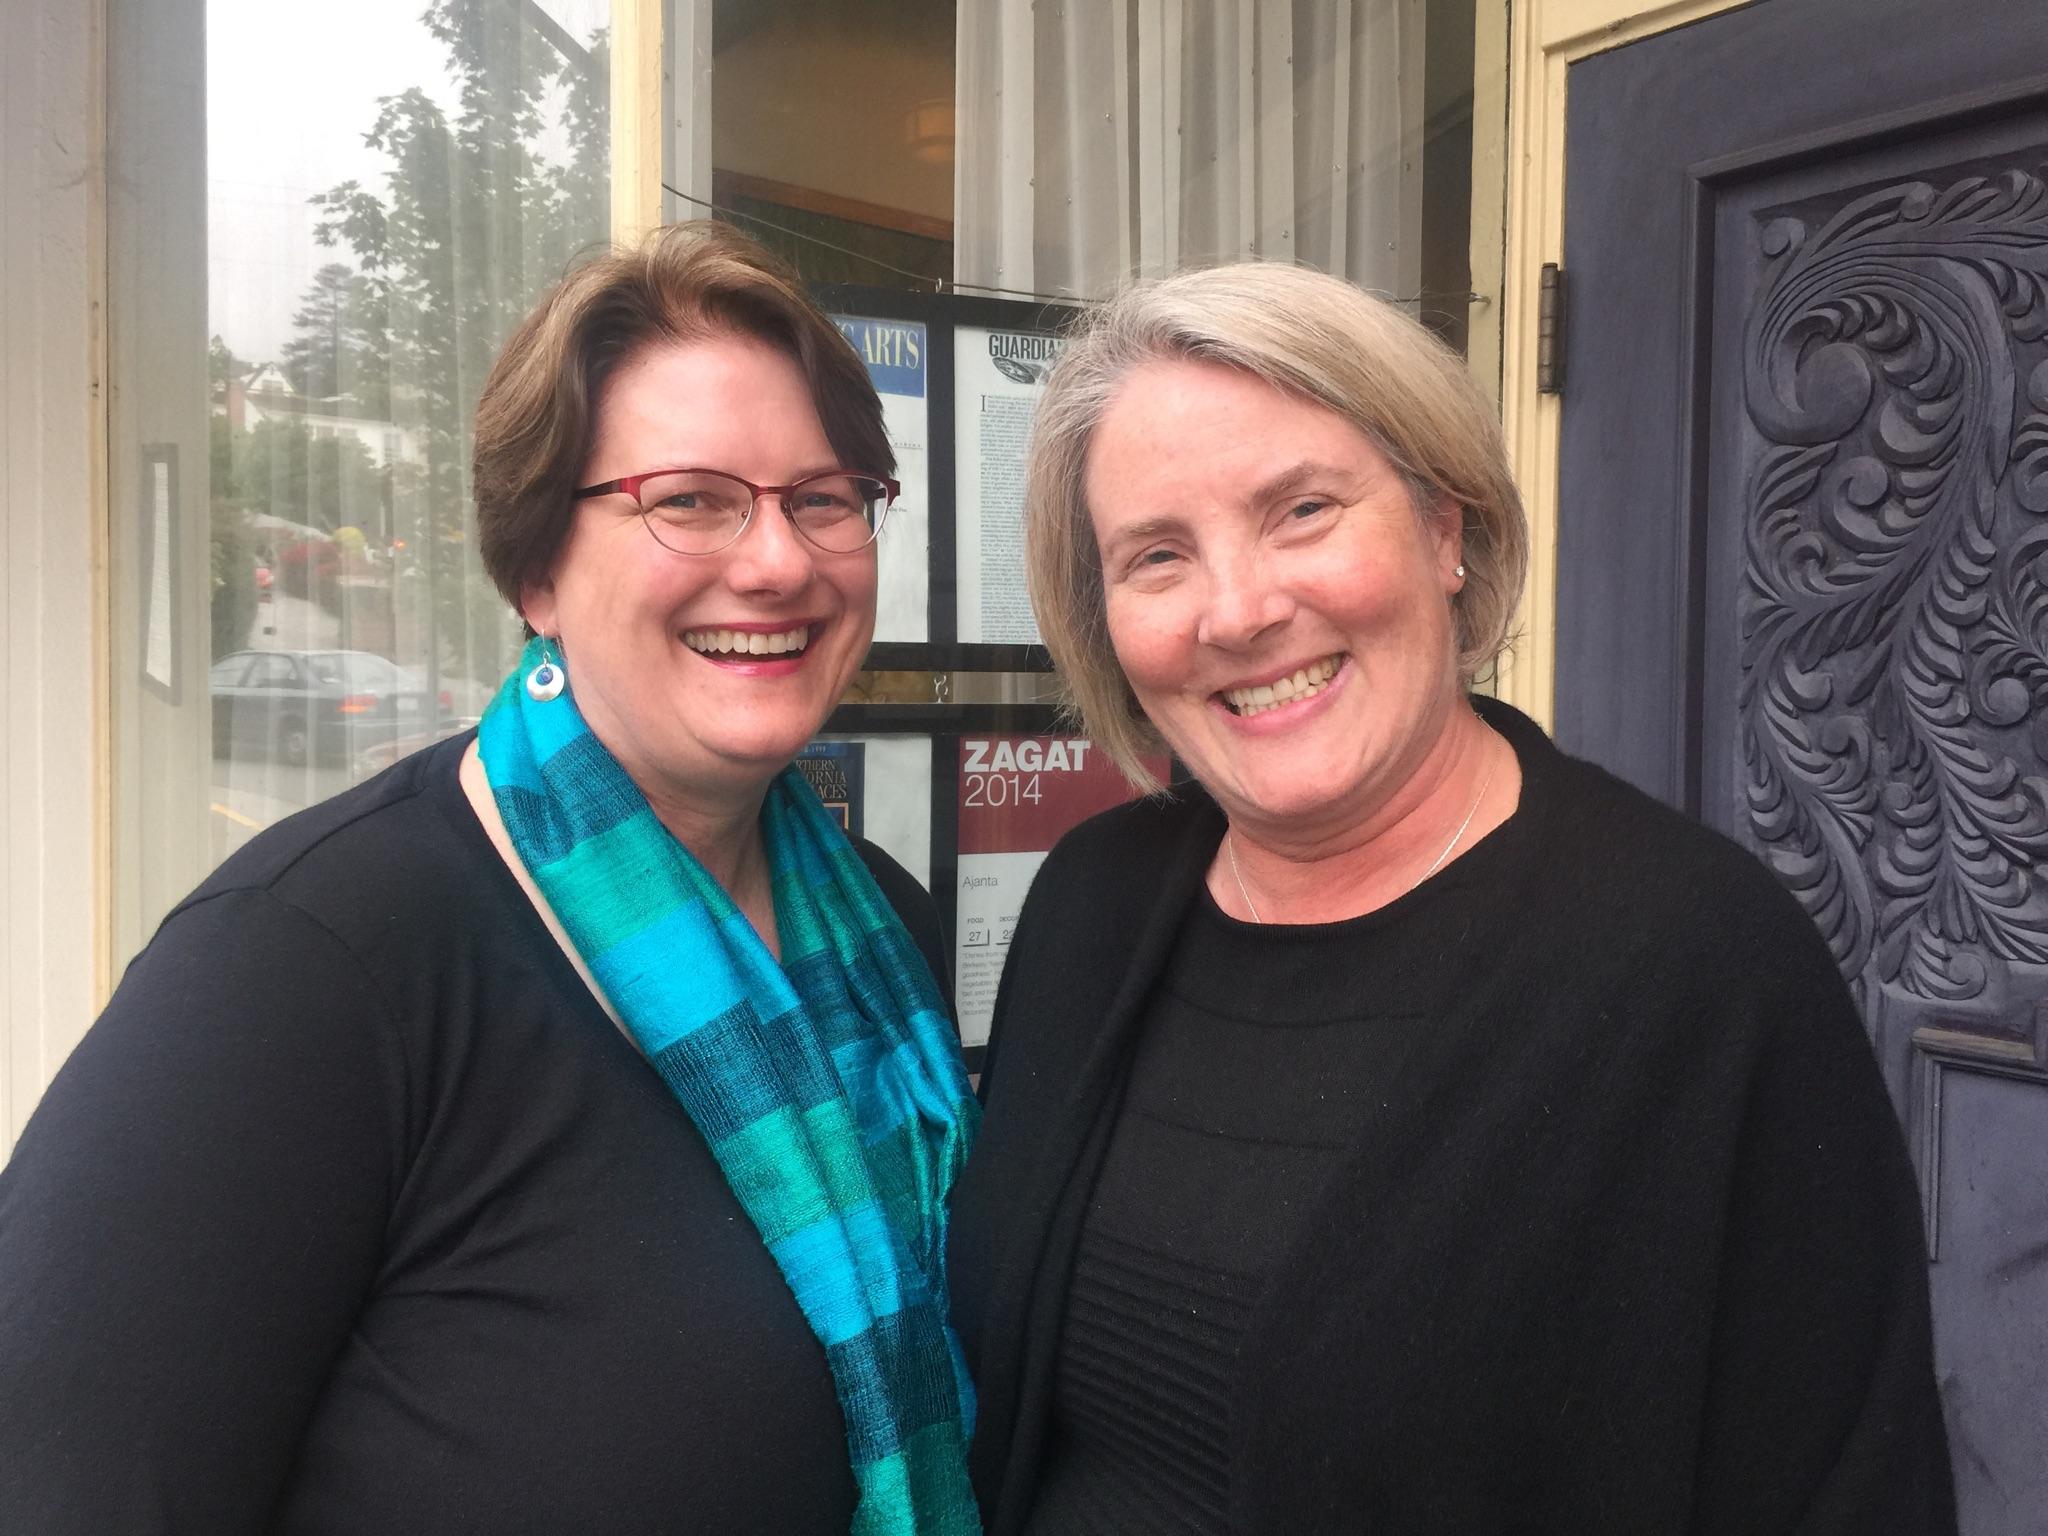 With my dear friend and wonderful colleague, Kara Schleunes.